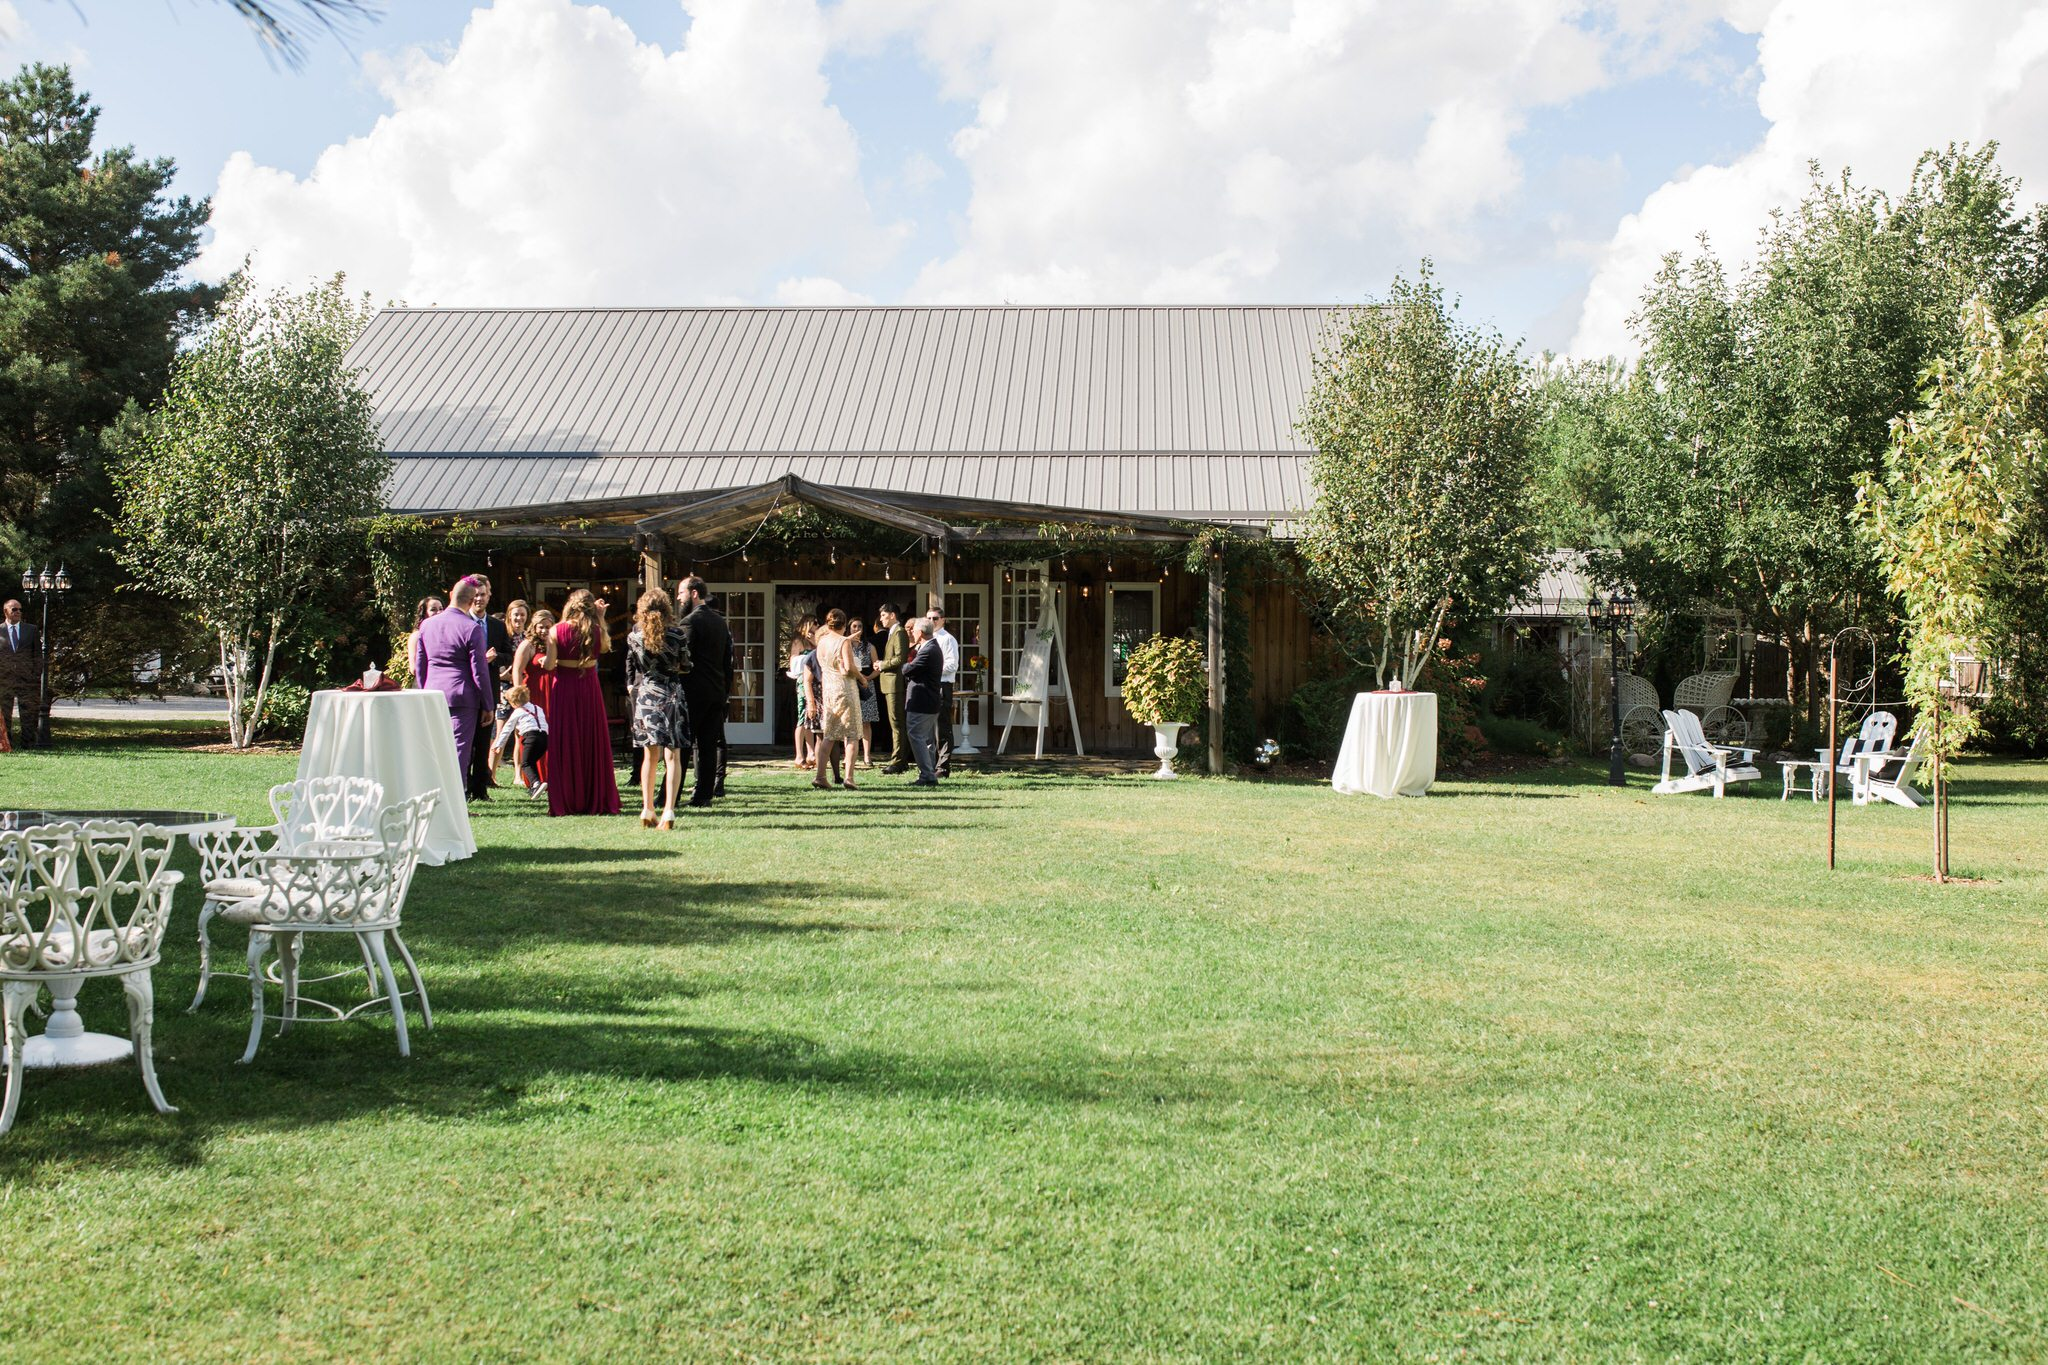 Northview Gardens Wedding - the lawn